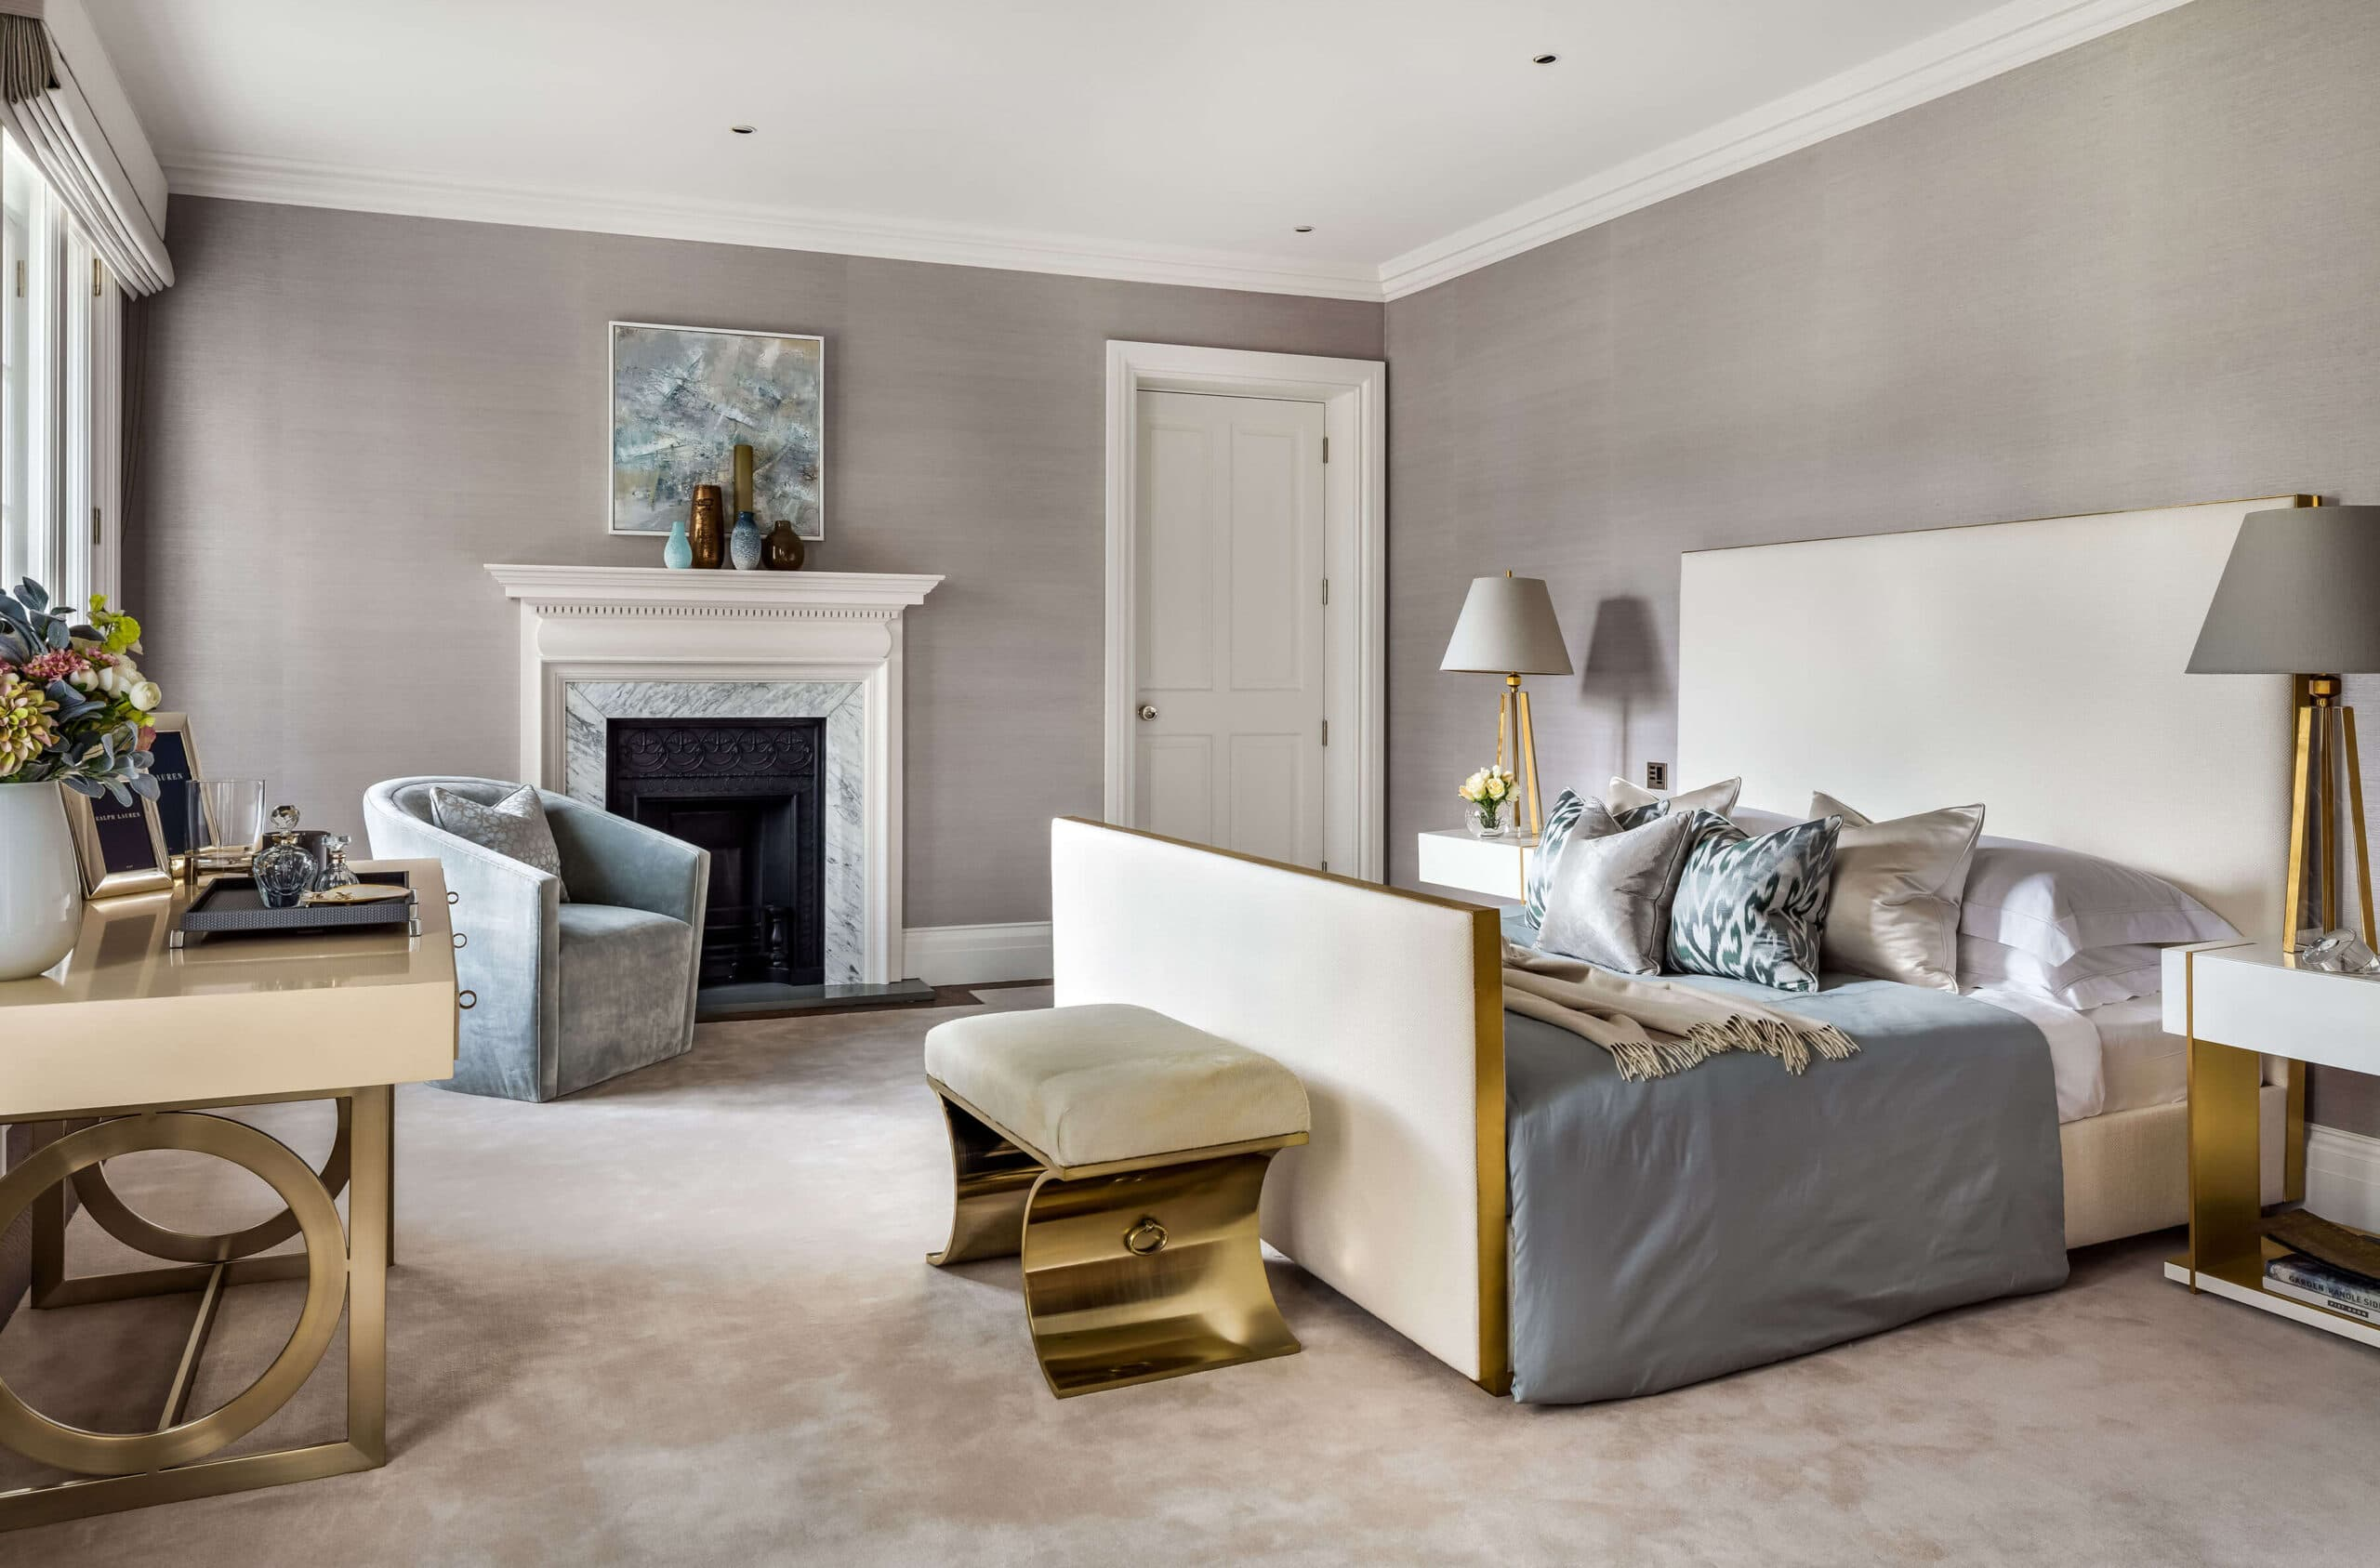 bedroom of interior design project in Westminster